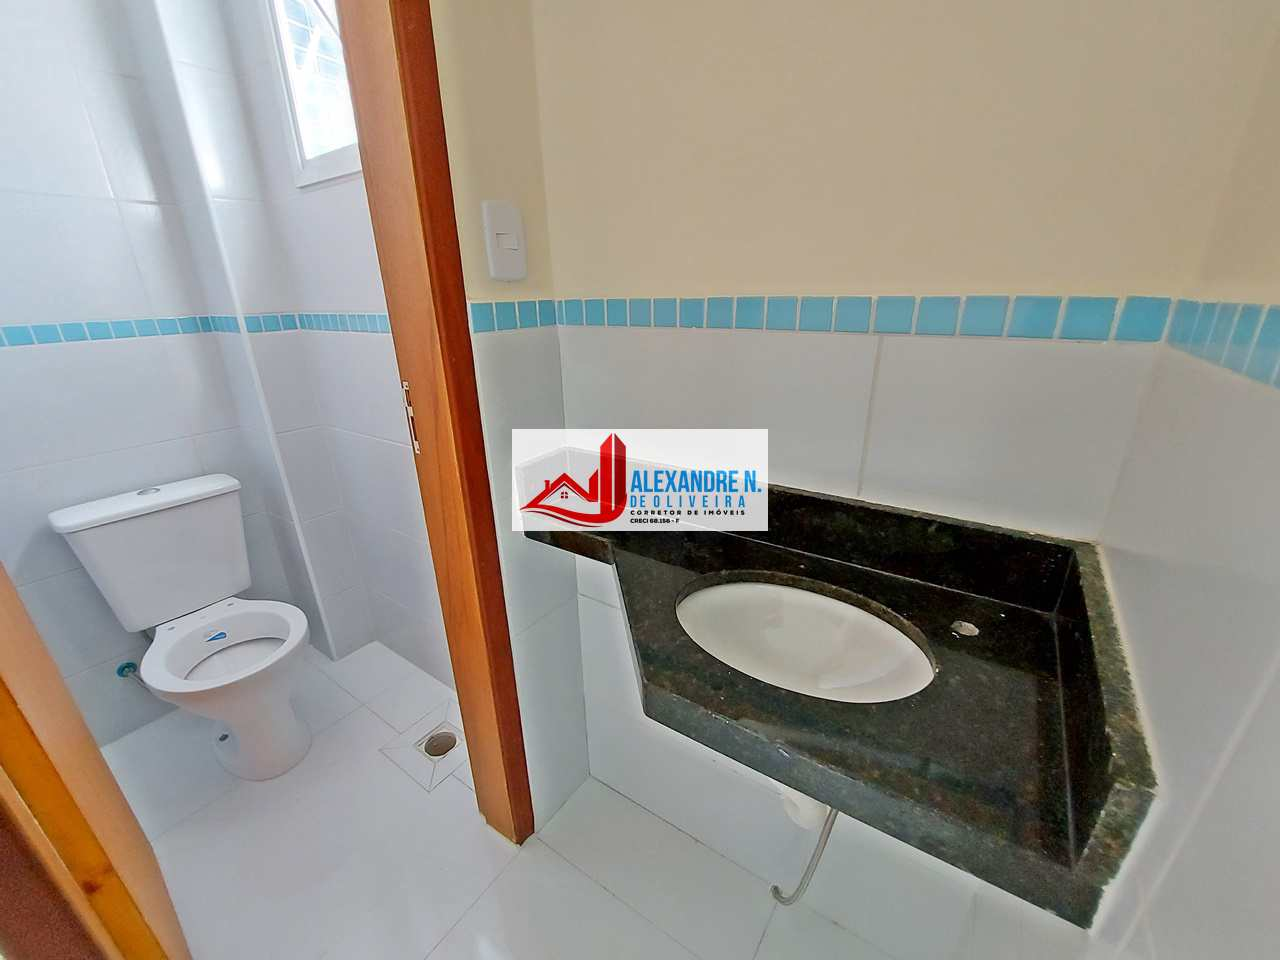 Apto 2 dorms, Caiçara, Praia Grande, Entr. 90 mil, AP00578